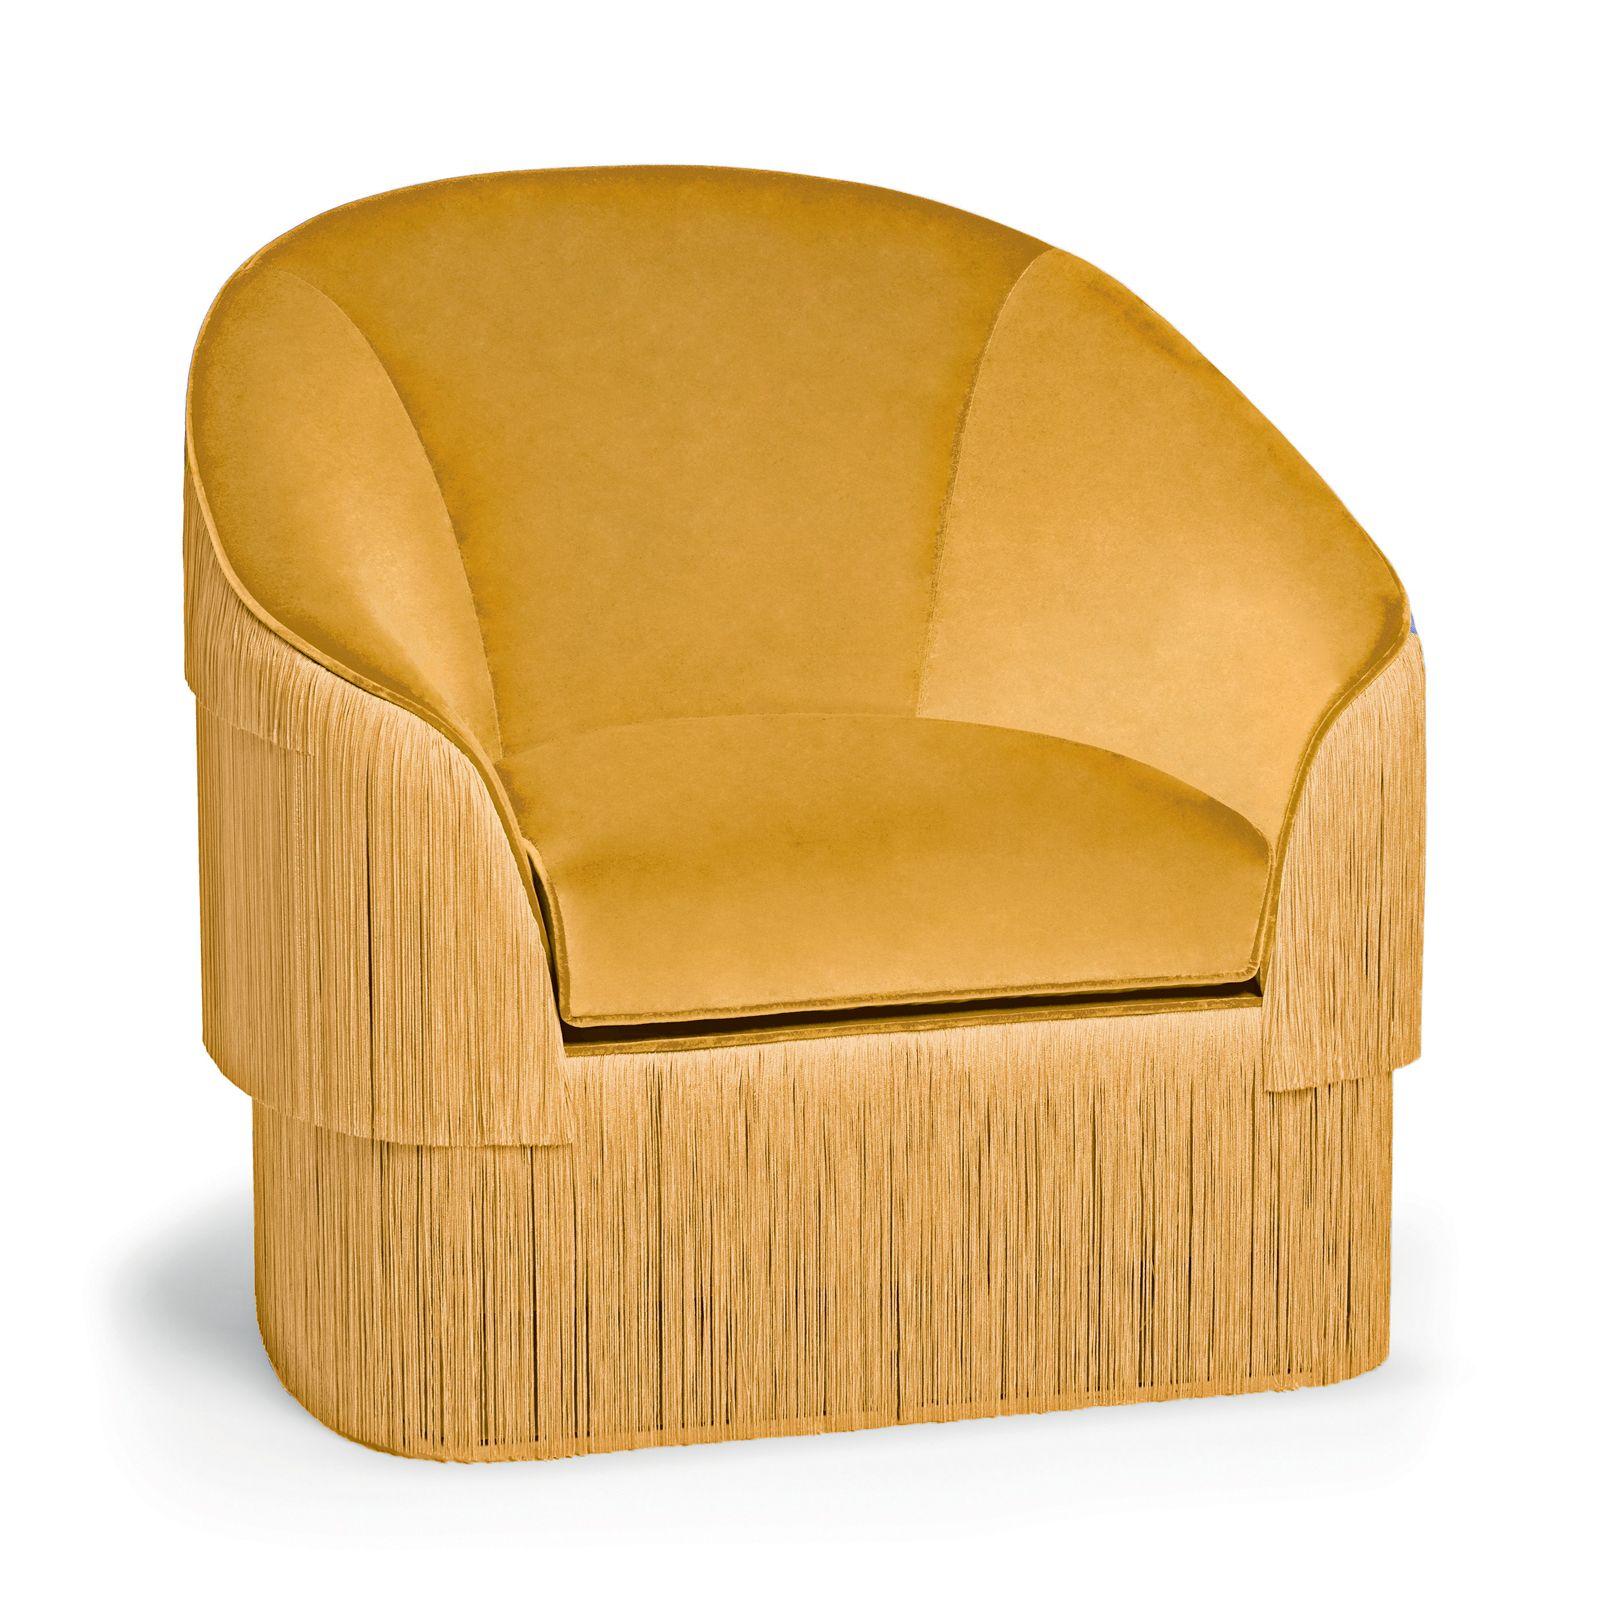 fringes series by munna design munnadesign stool armchair rh pinterest com